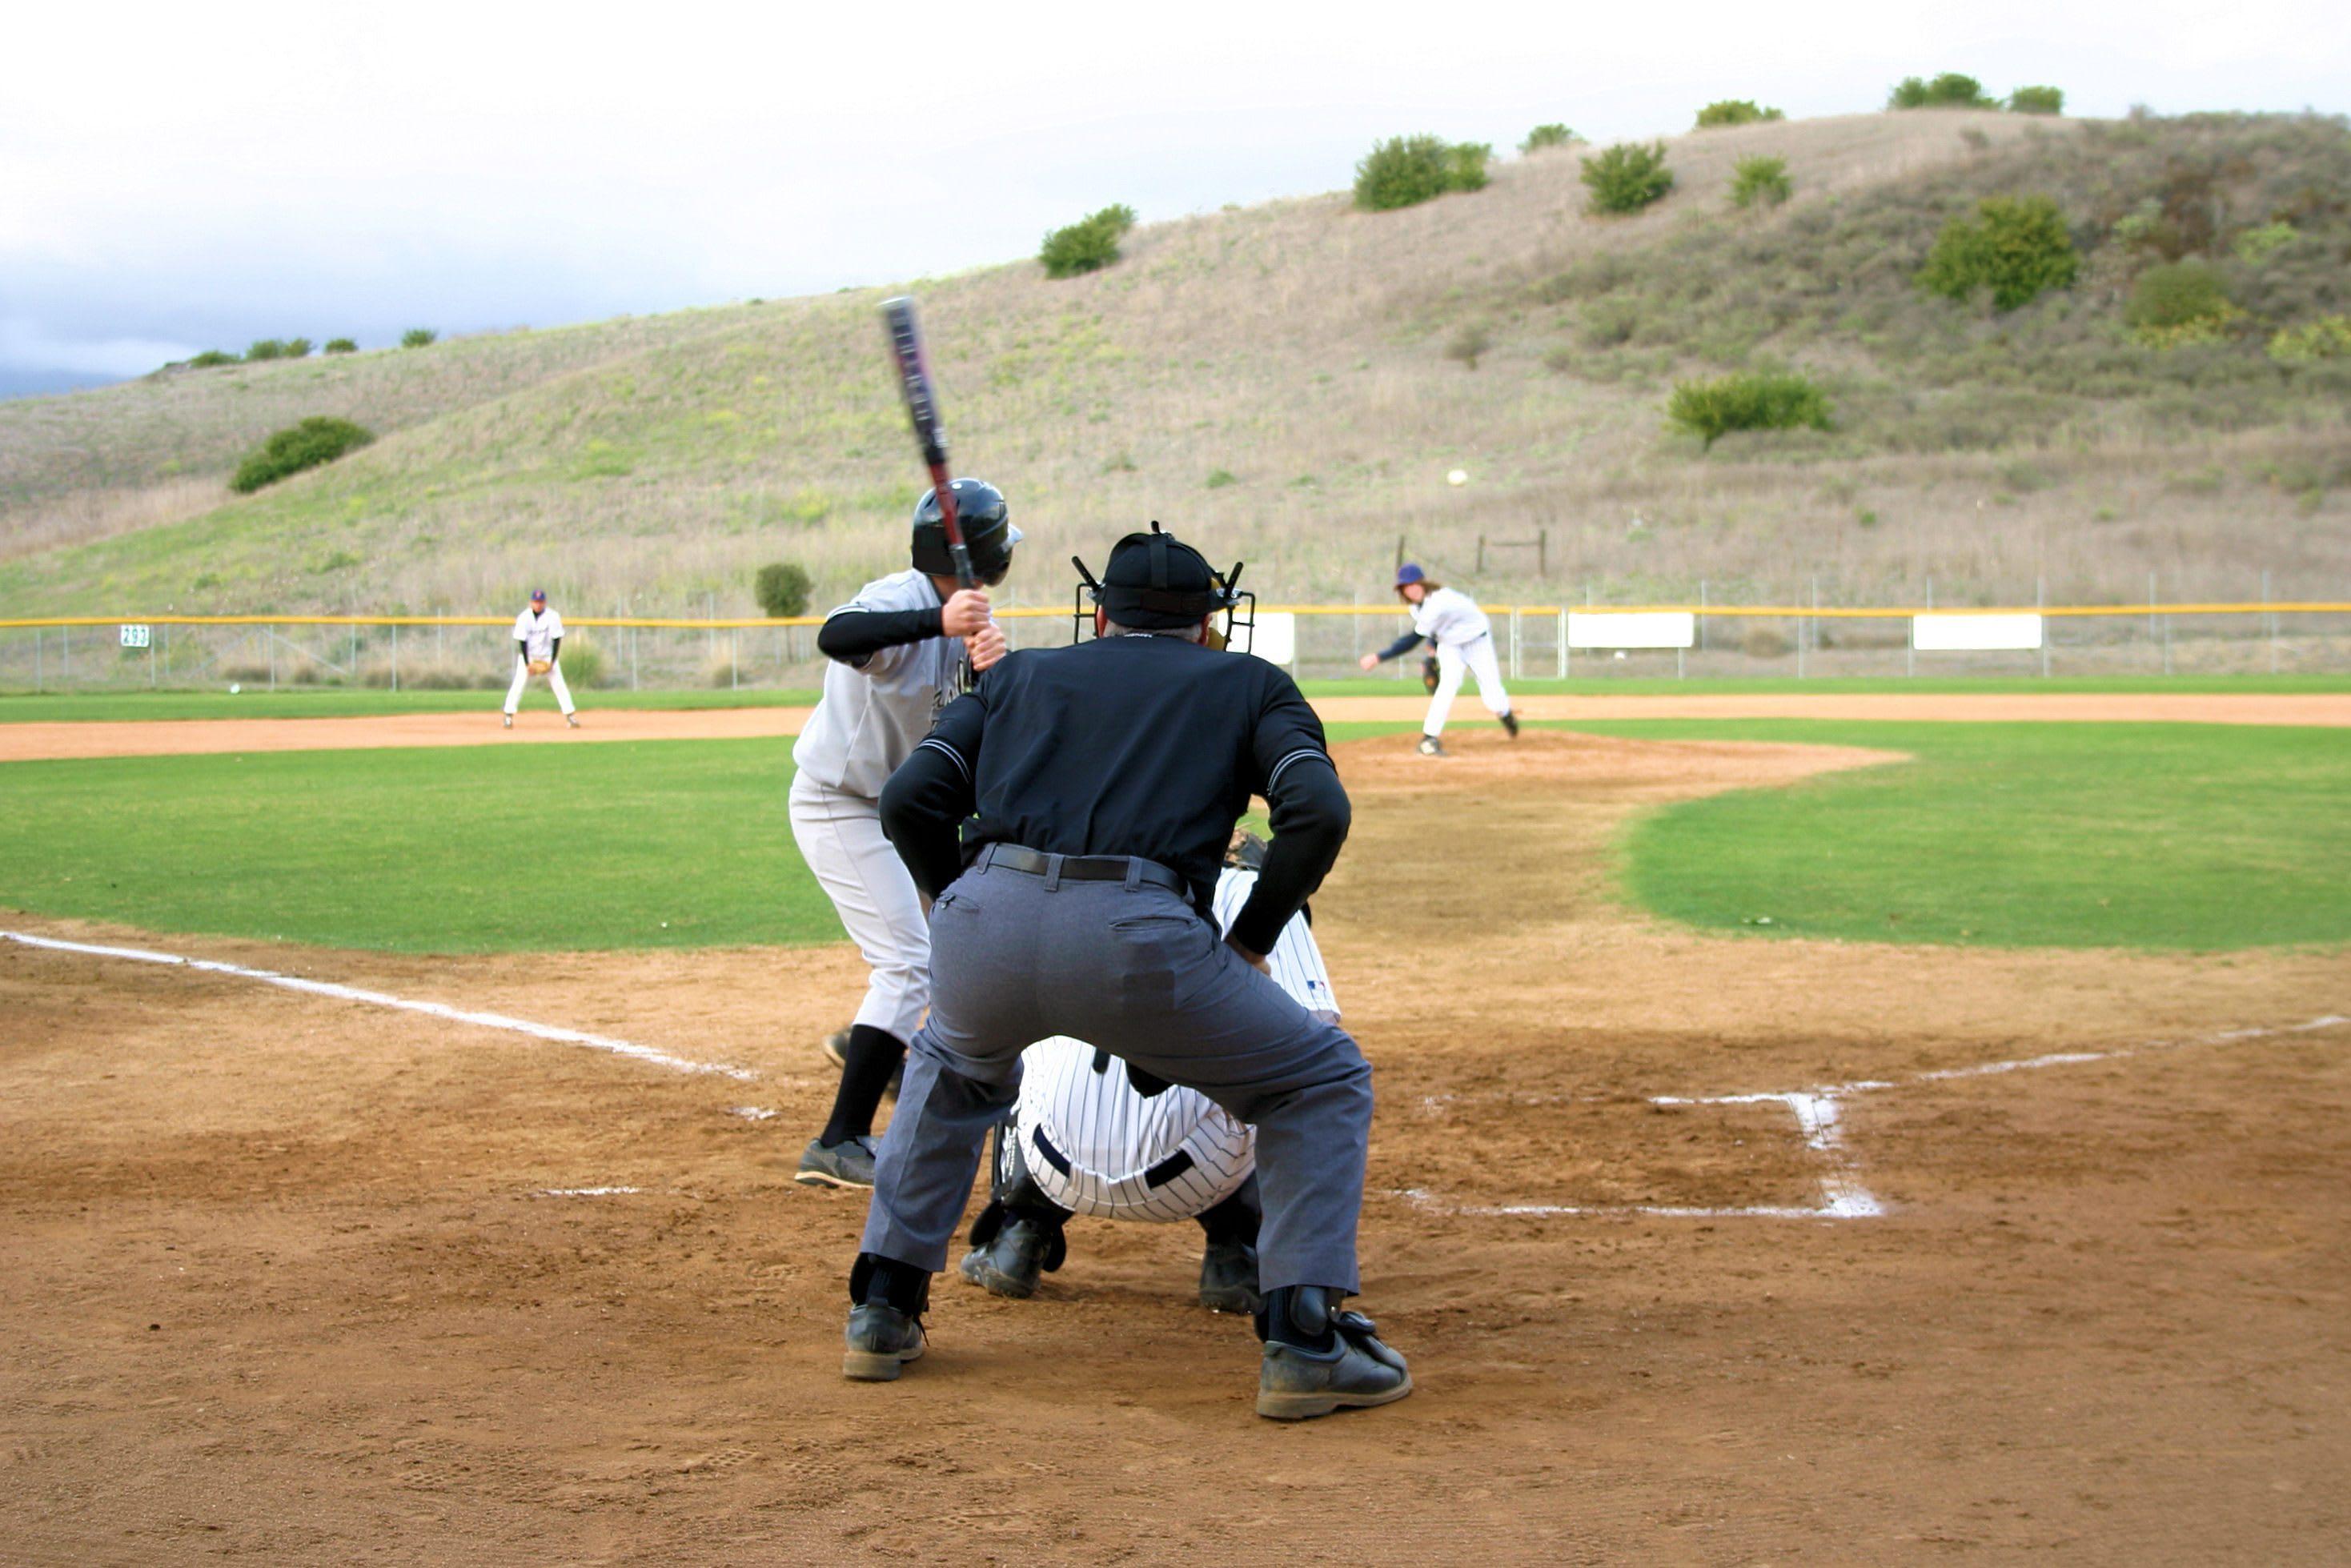 plate umpire